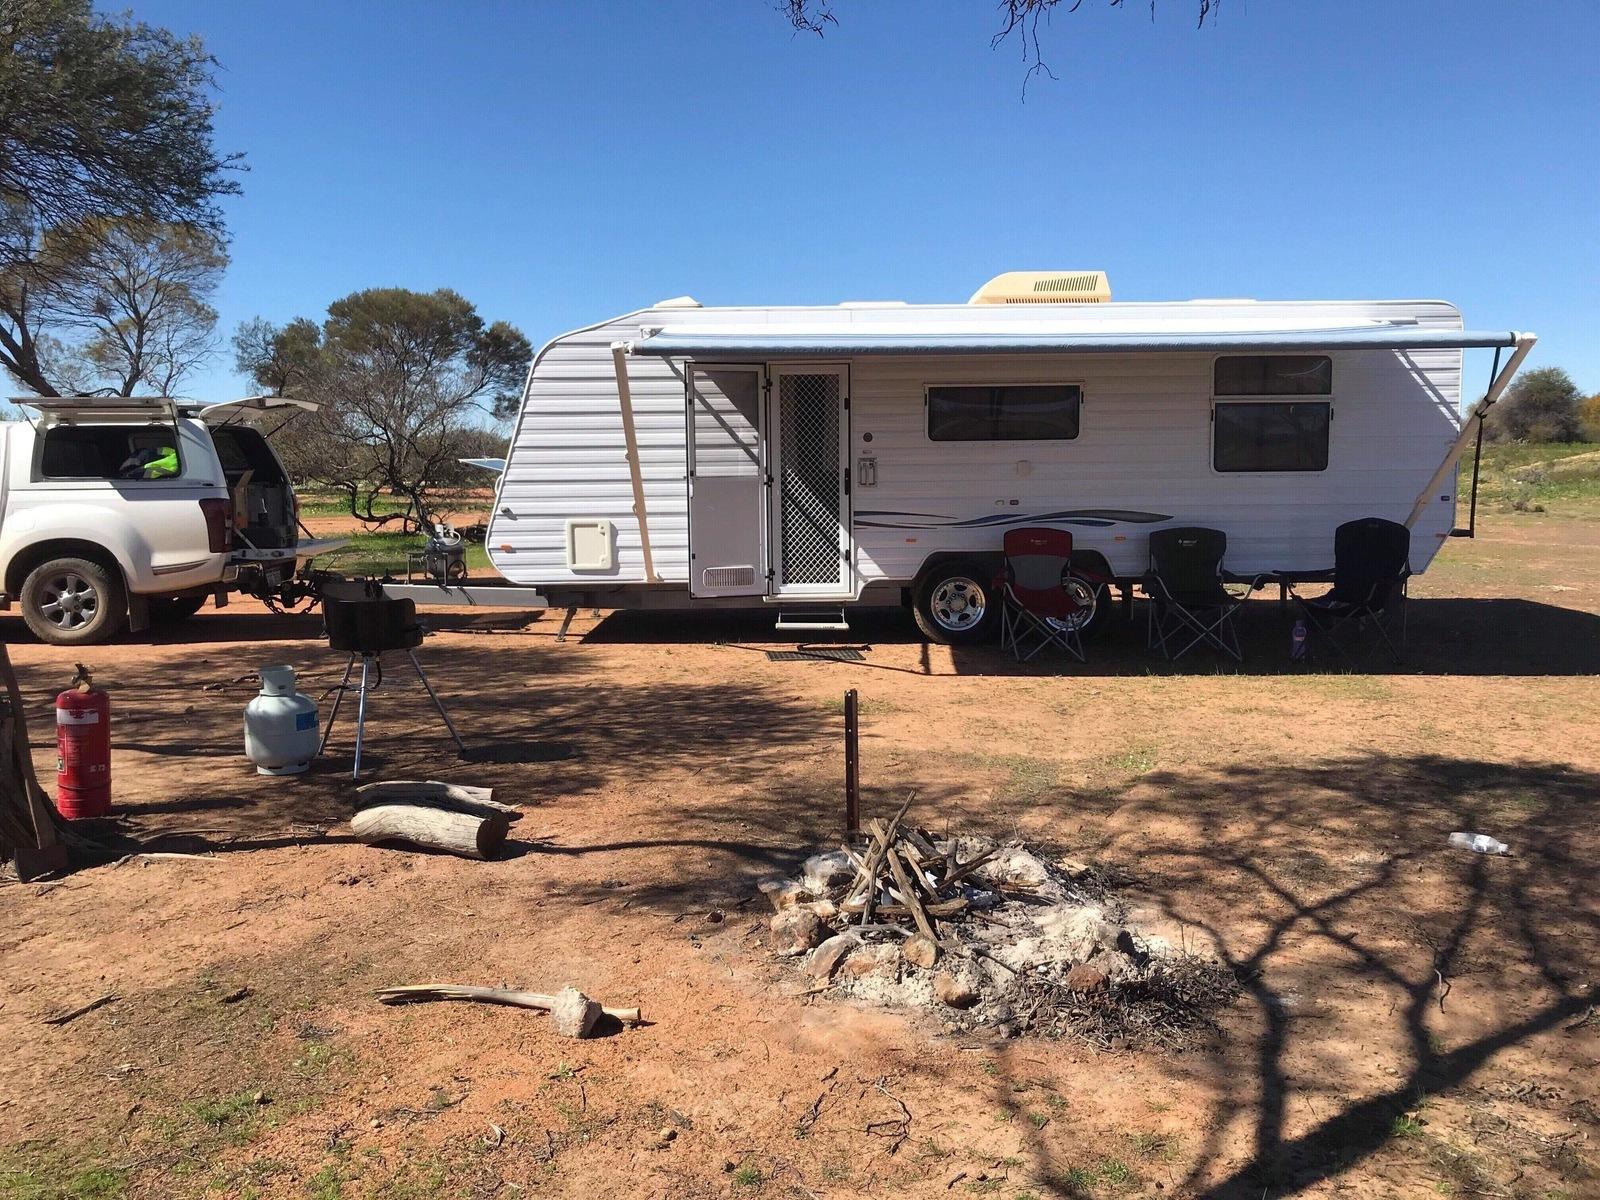 Oakabella Family Caravan, Sleeps 4, Coral Coast, Geraldton, Kalbarri - Cover Image